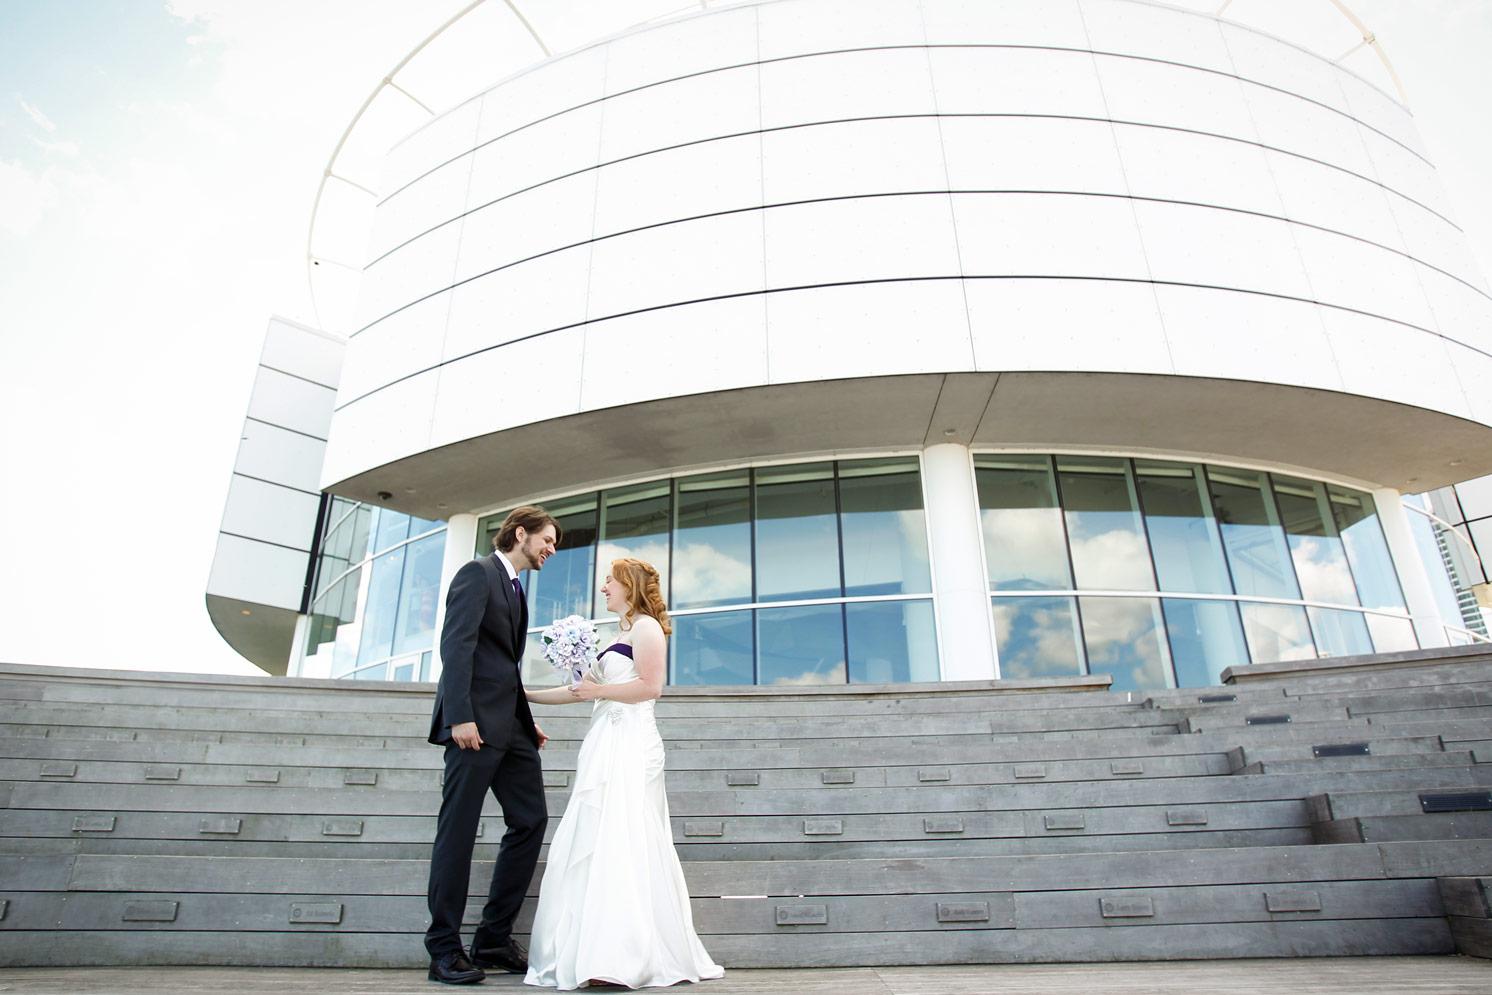 milwaukee-discovery-world-pier-wisconsin-wedding-ruthie-hauge-photography-14.jpg